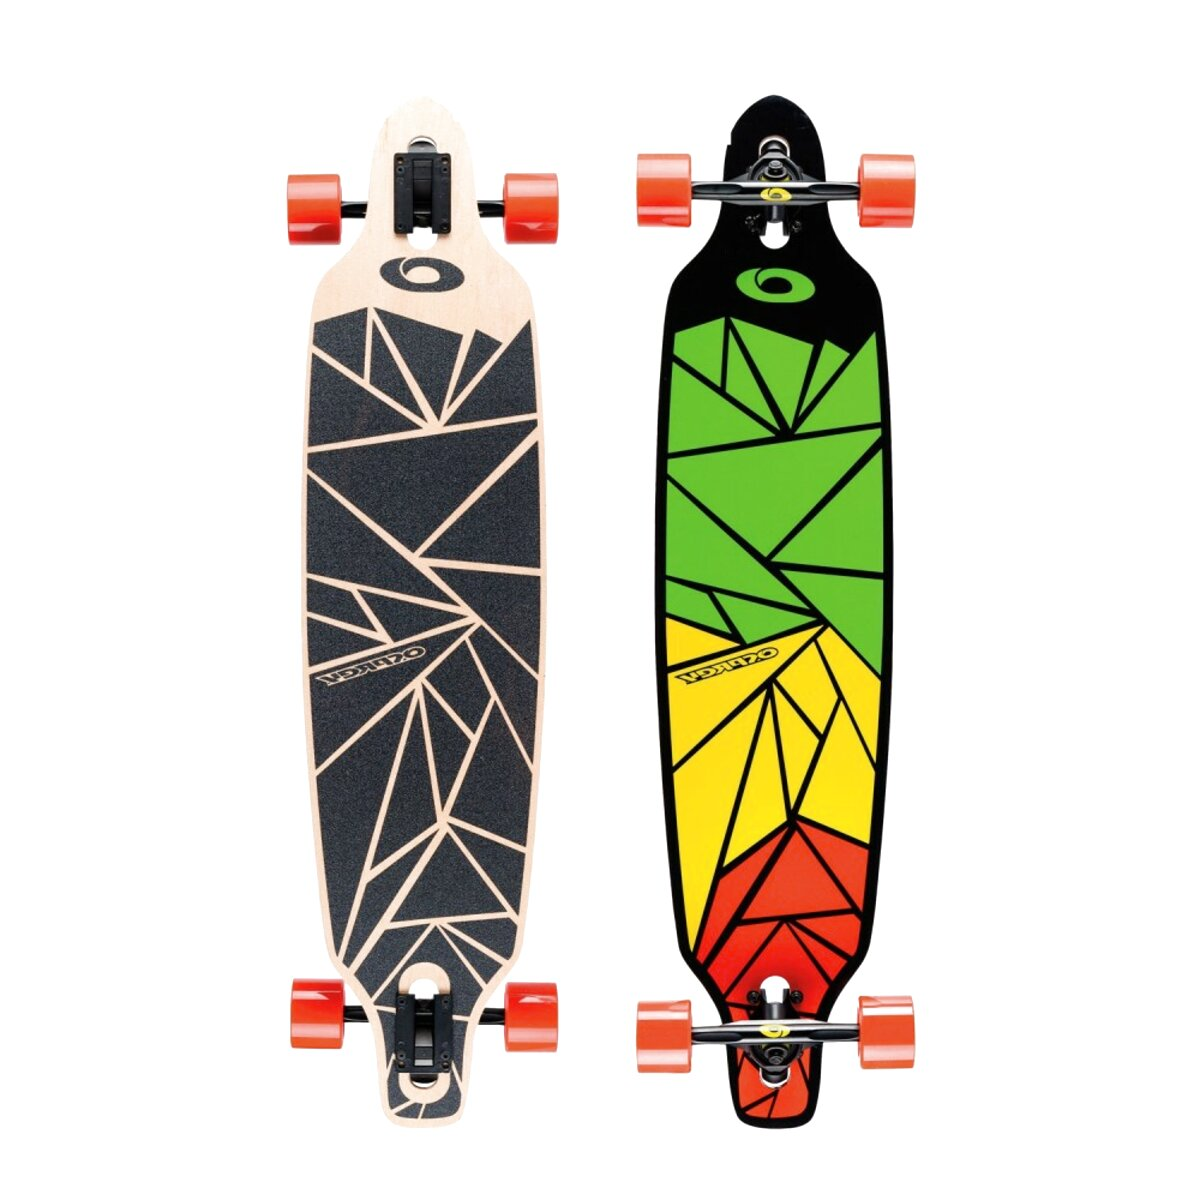 Two Bare Feet MD 824 Complete 46 Pintail Longboard Skateboard